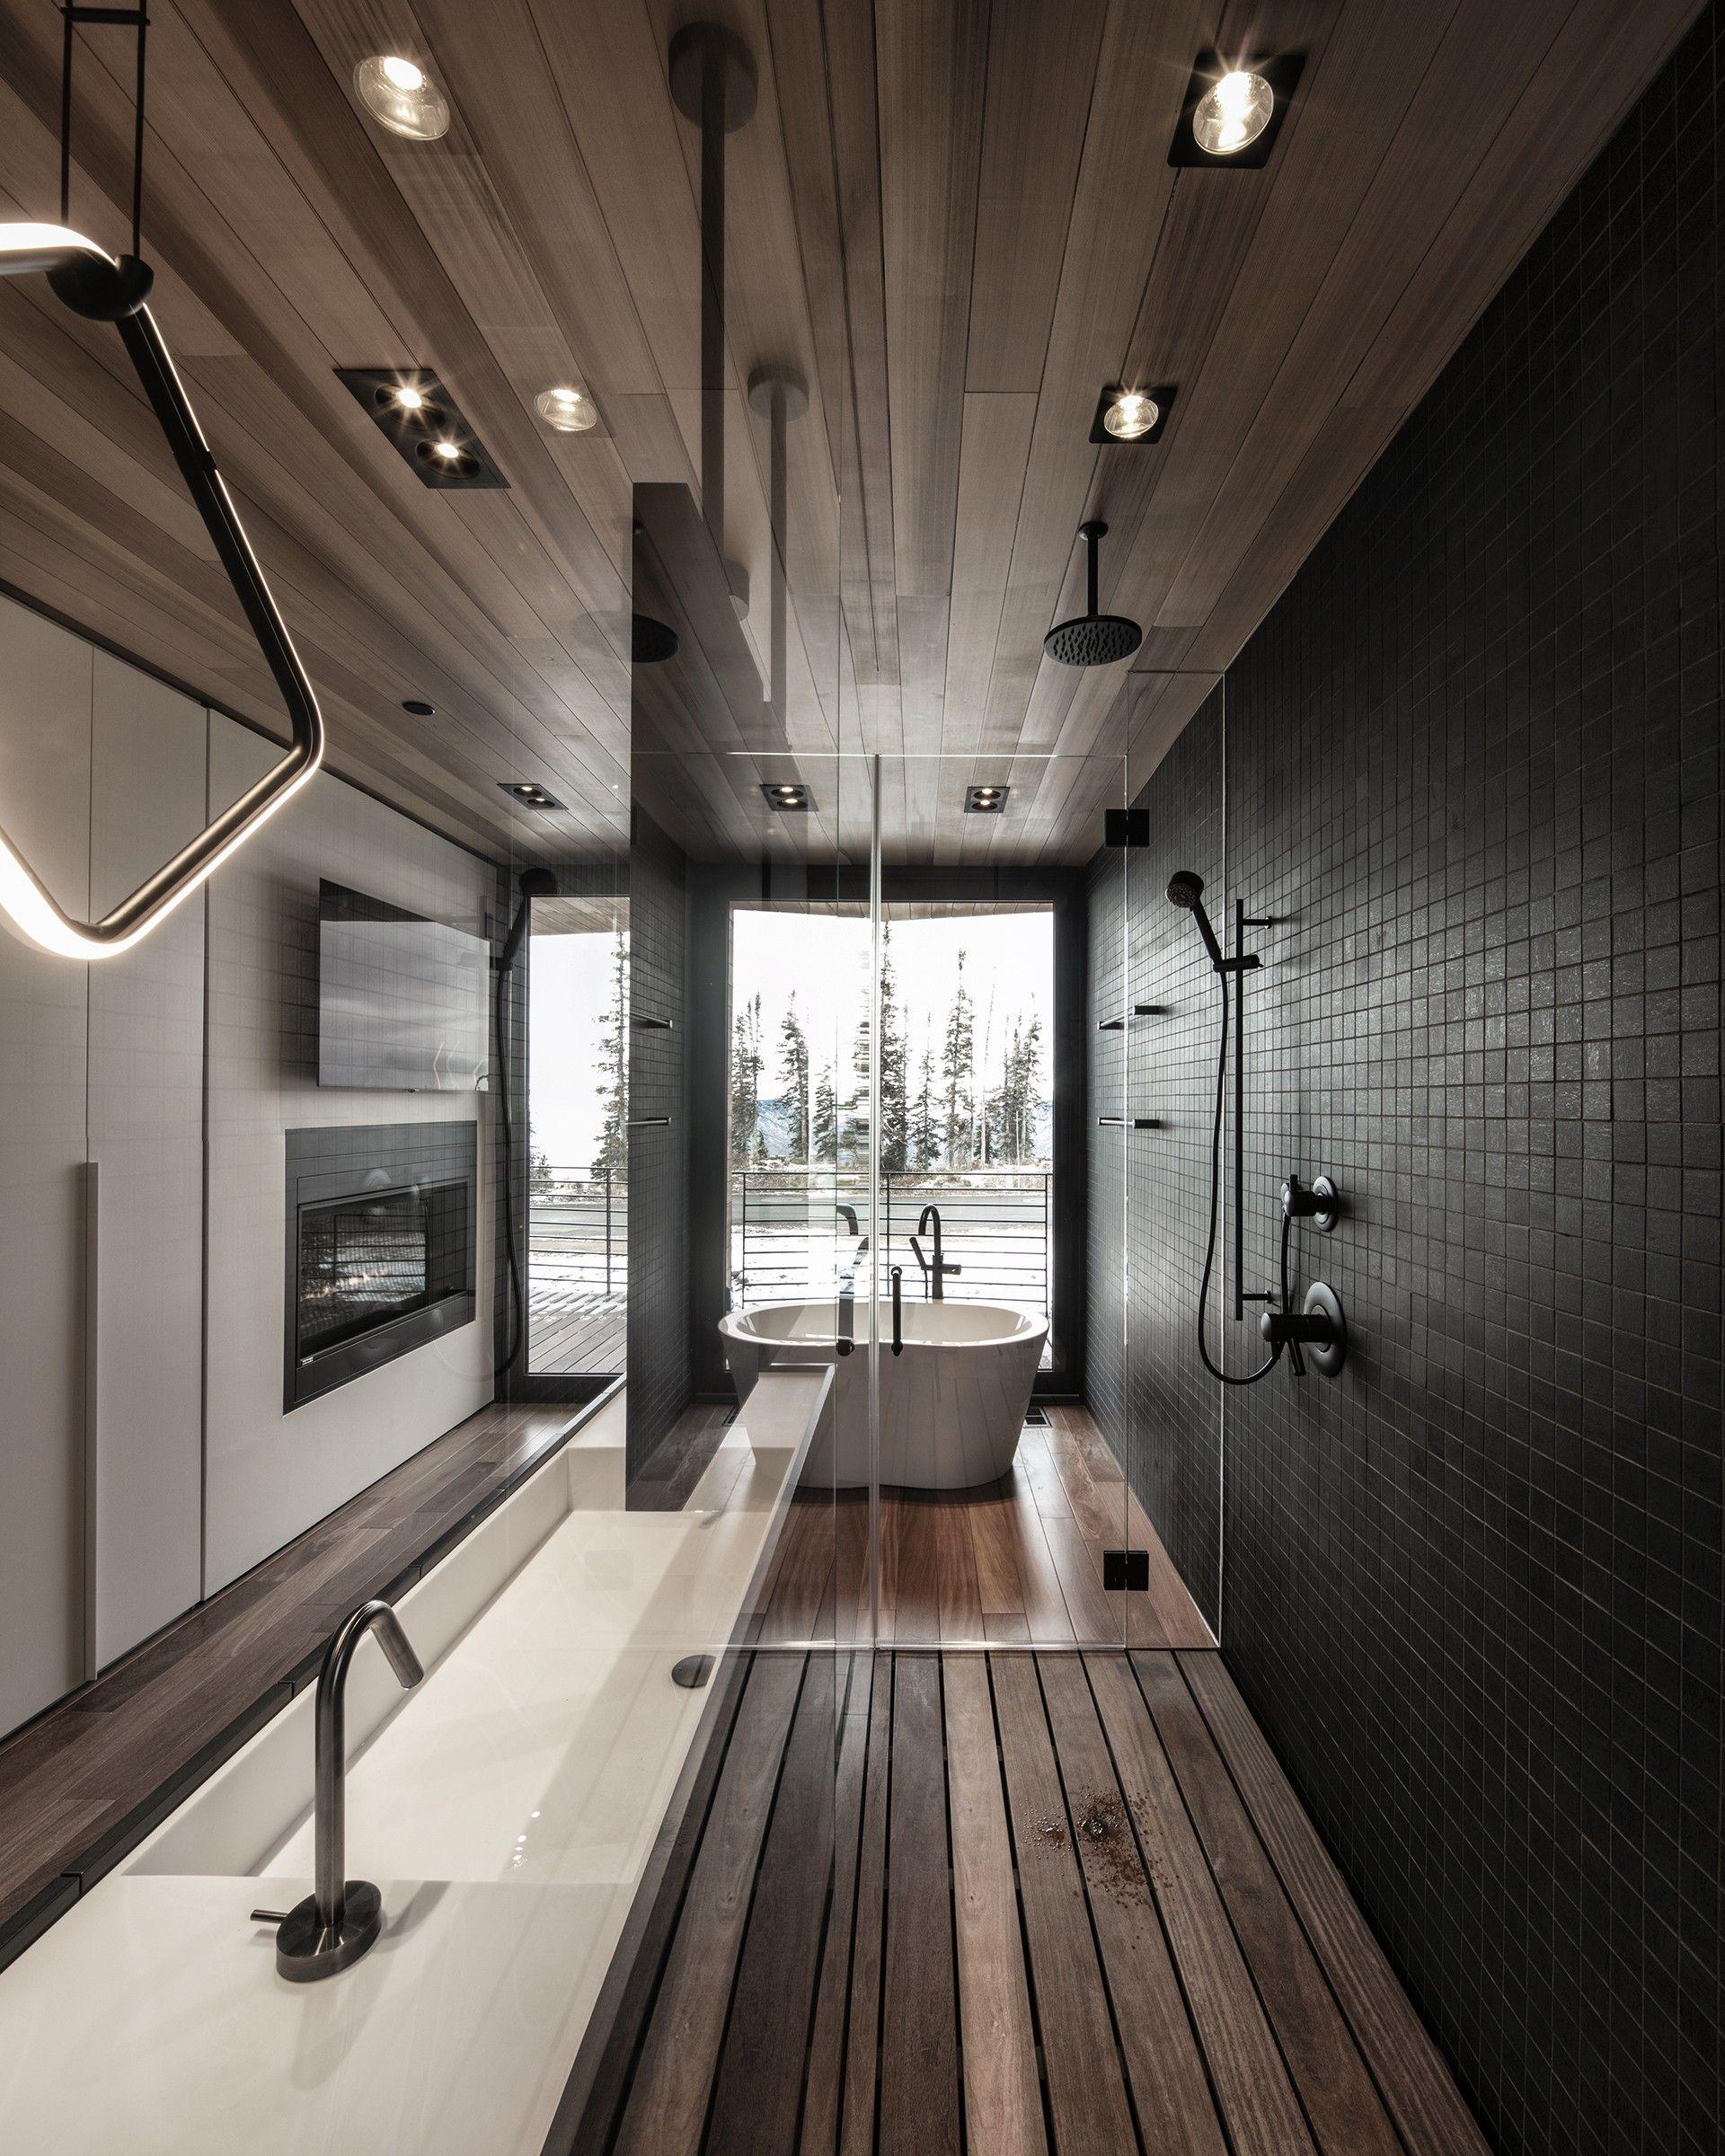 The Kinii The Falcon S Nest By The Italian Architects Of Obicua Floornature In 2020 Modern Lake House Bathroom Design Design